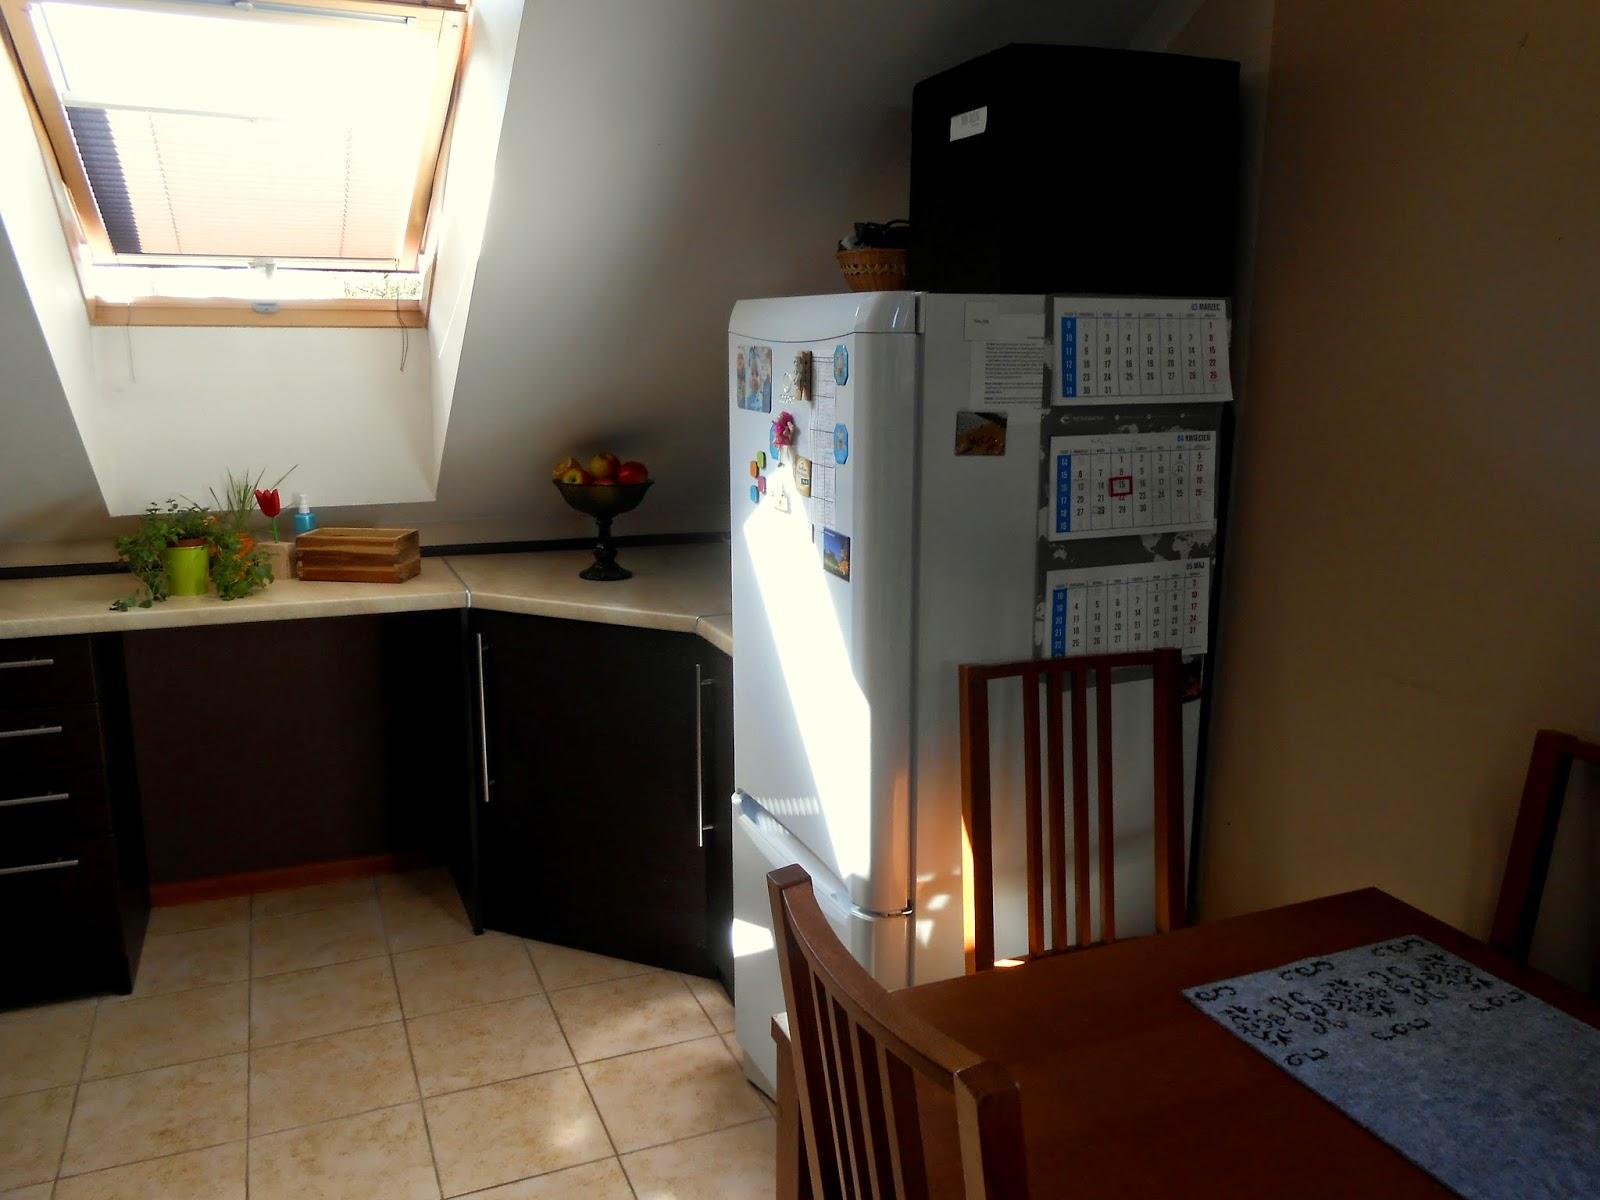 Mała kuchnia na poddaszu  Mama trojki pl -> Mala Kuchnia Ze Skosem